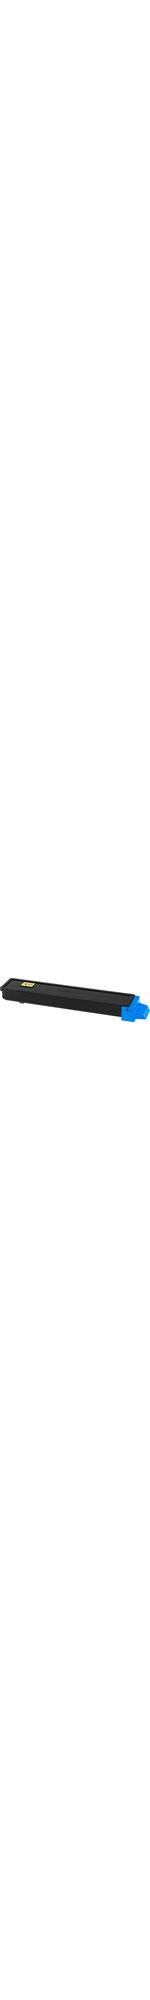 Kyocera TK-895K Toner Cartridge - Black